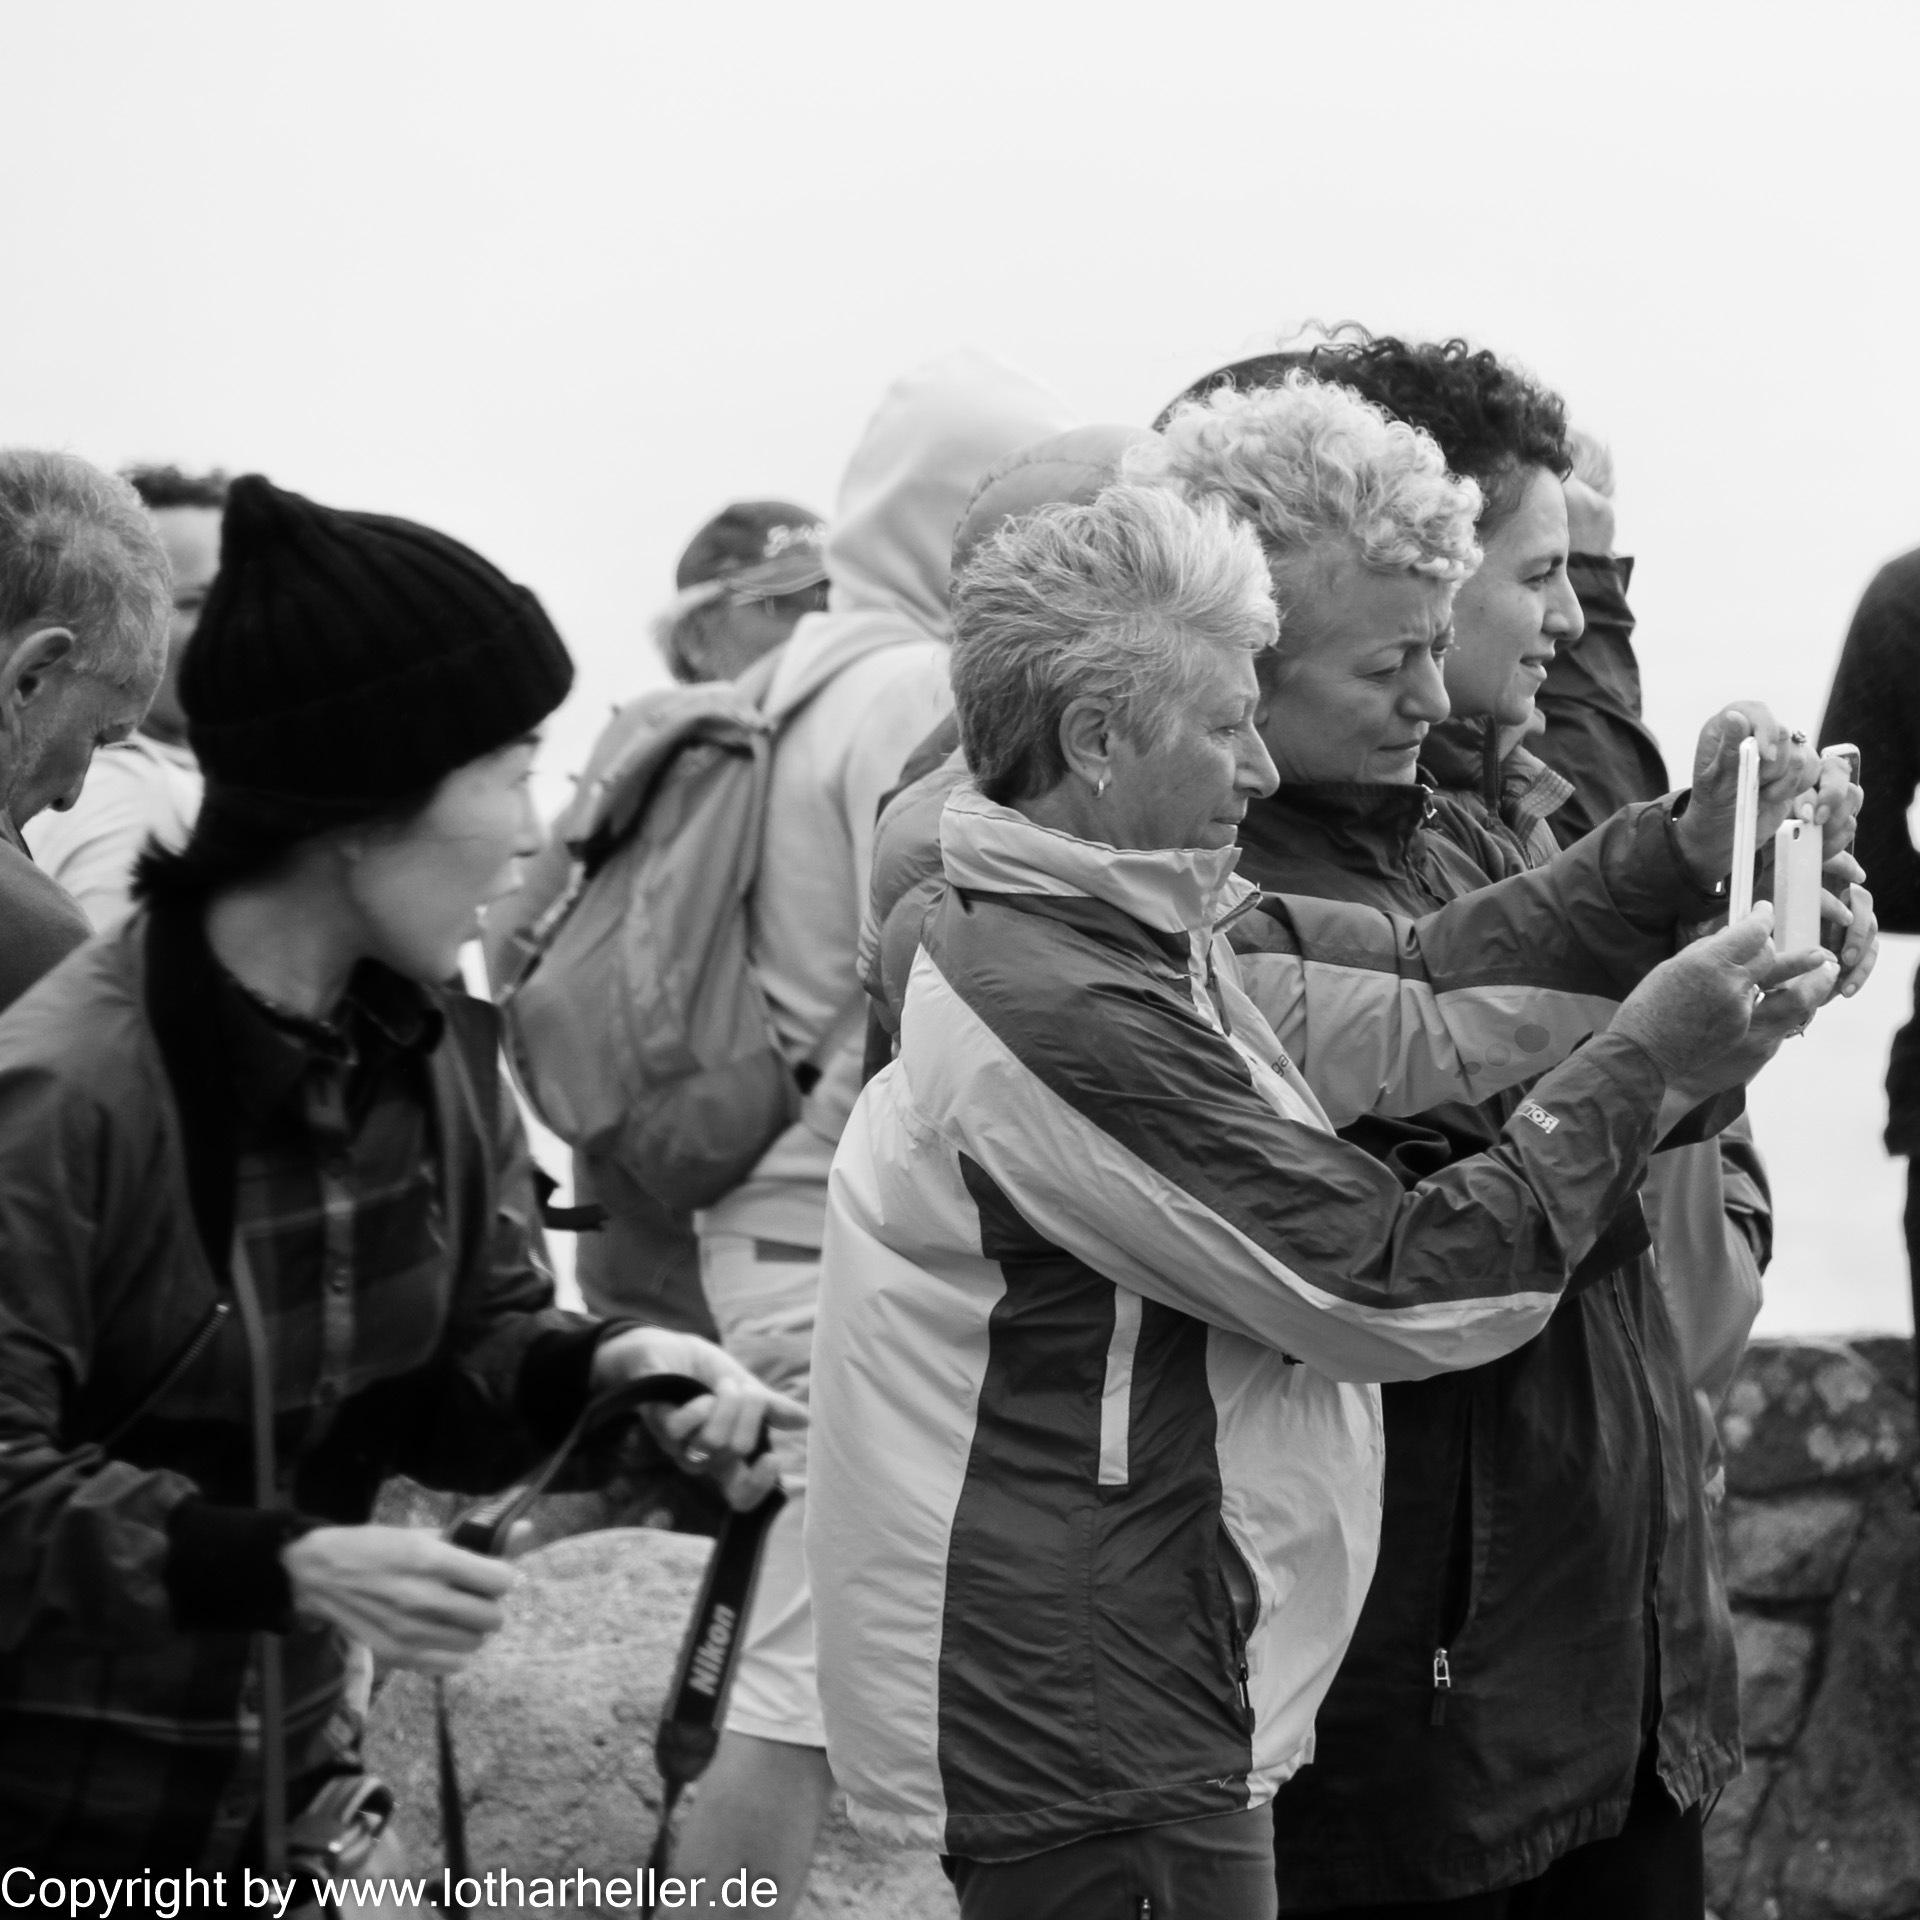 Photographers Wind by Lothar Heller